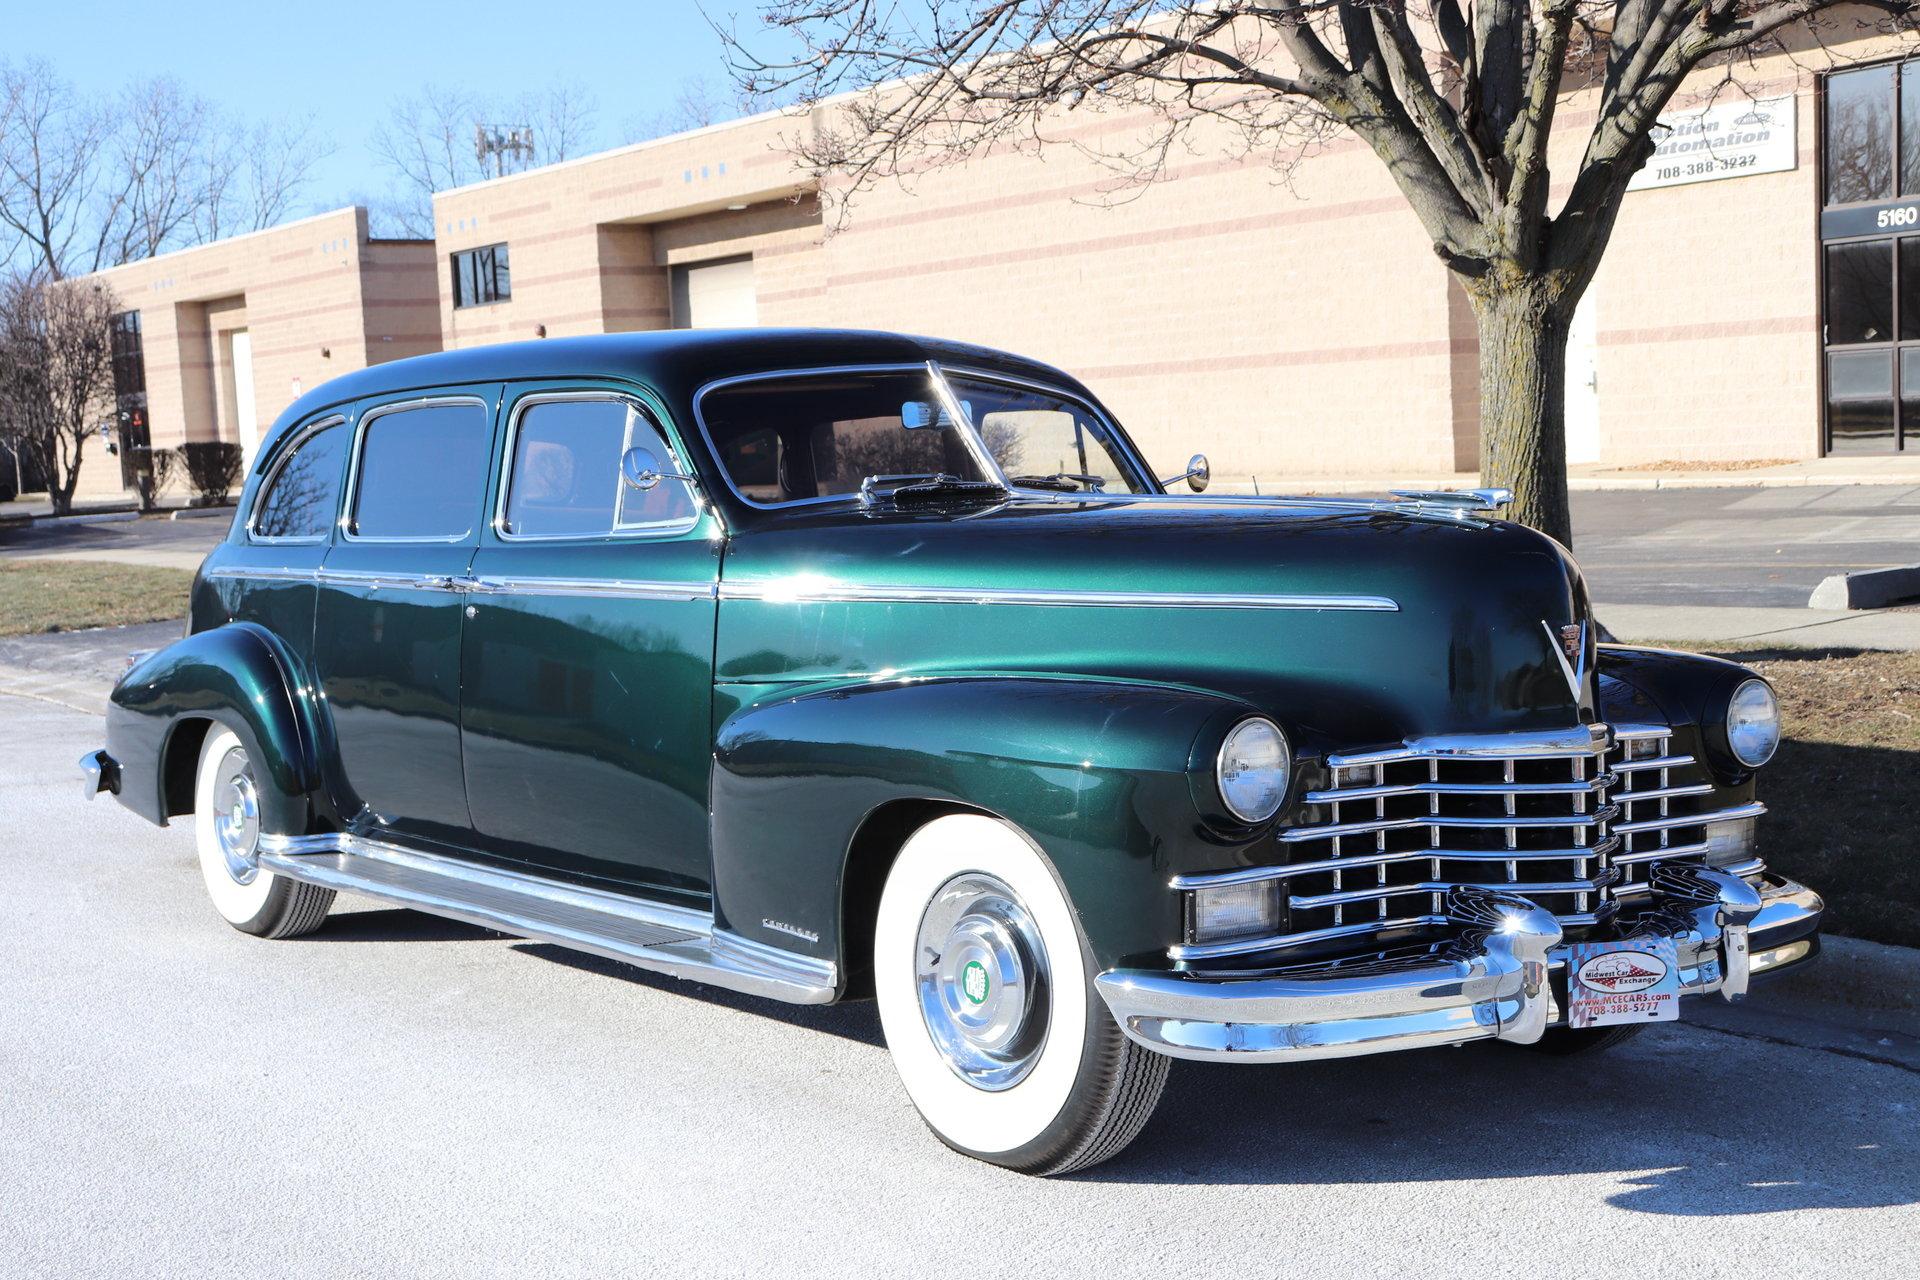 491750f55a342 hd 1946 cadillac fleetwood 4 door limousine 7 passenger